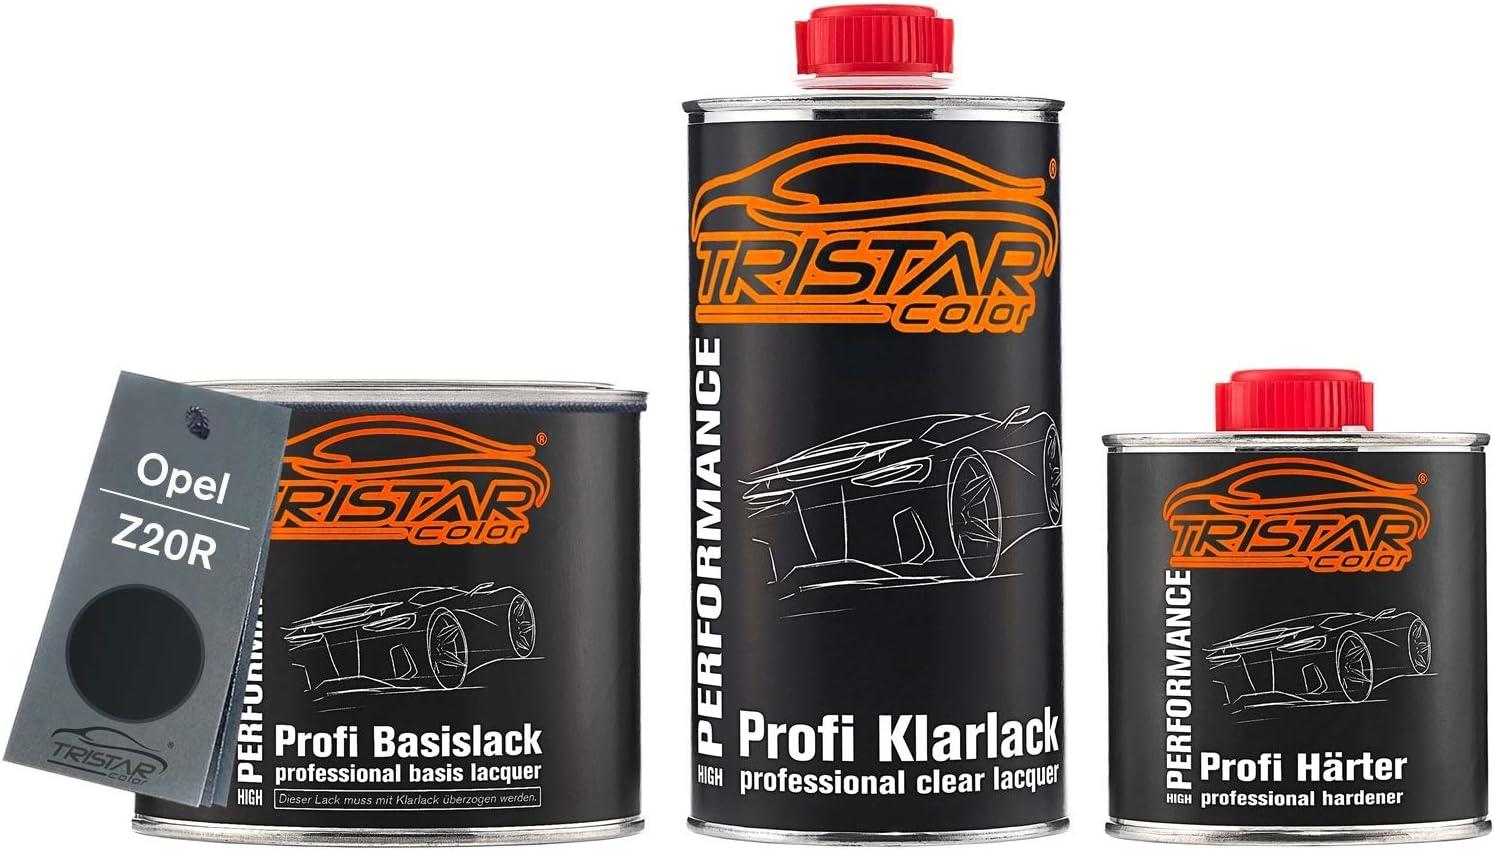 Tristarcolor Autolack Set Dose Spritzfertig Für Opel Z20r Saphirschwarz Metallic Black Sapphire Metallic Basislack 2k Klarlack 1 25l Auto